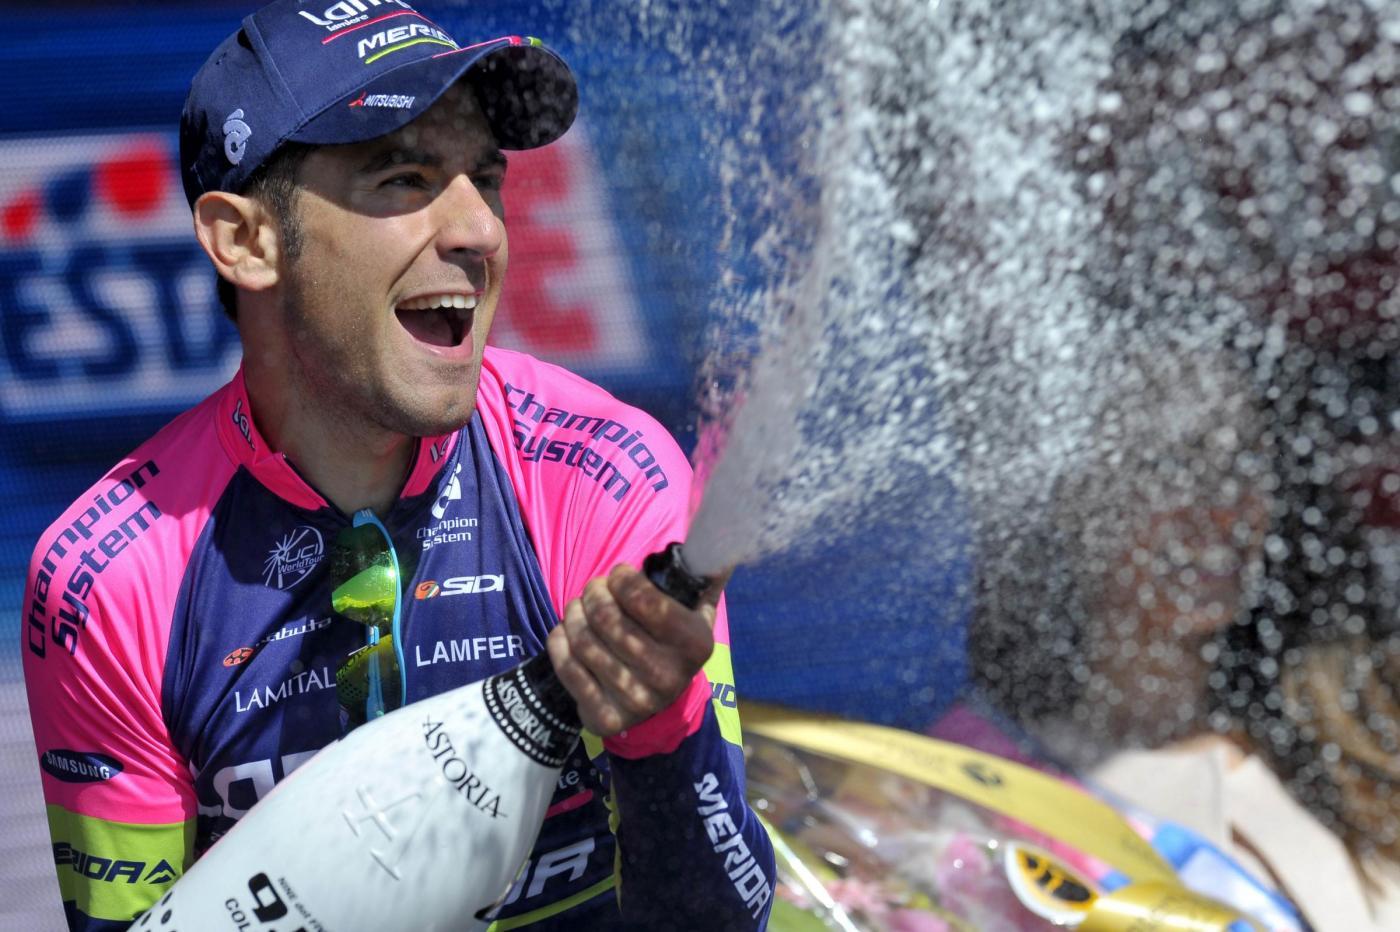 Giro d'Italia 2014: Diego Ulissi vince la tappa dedicata a Pantani